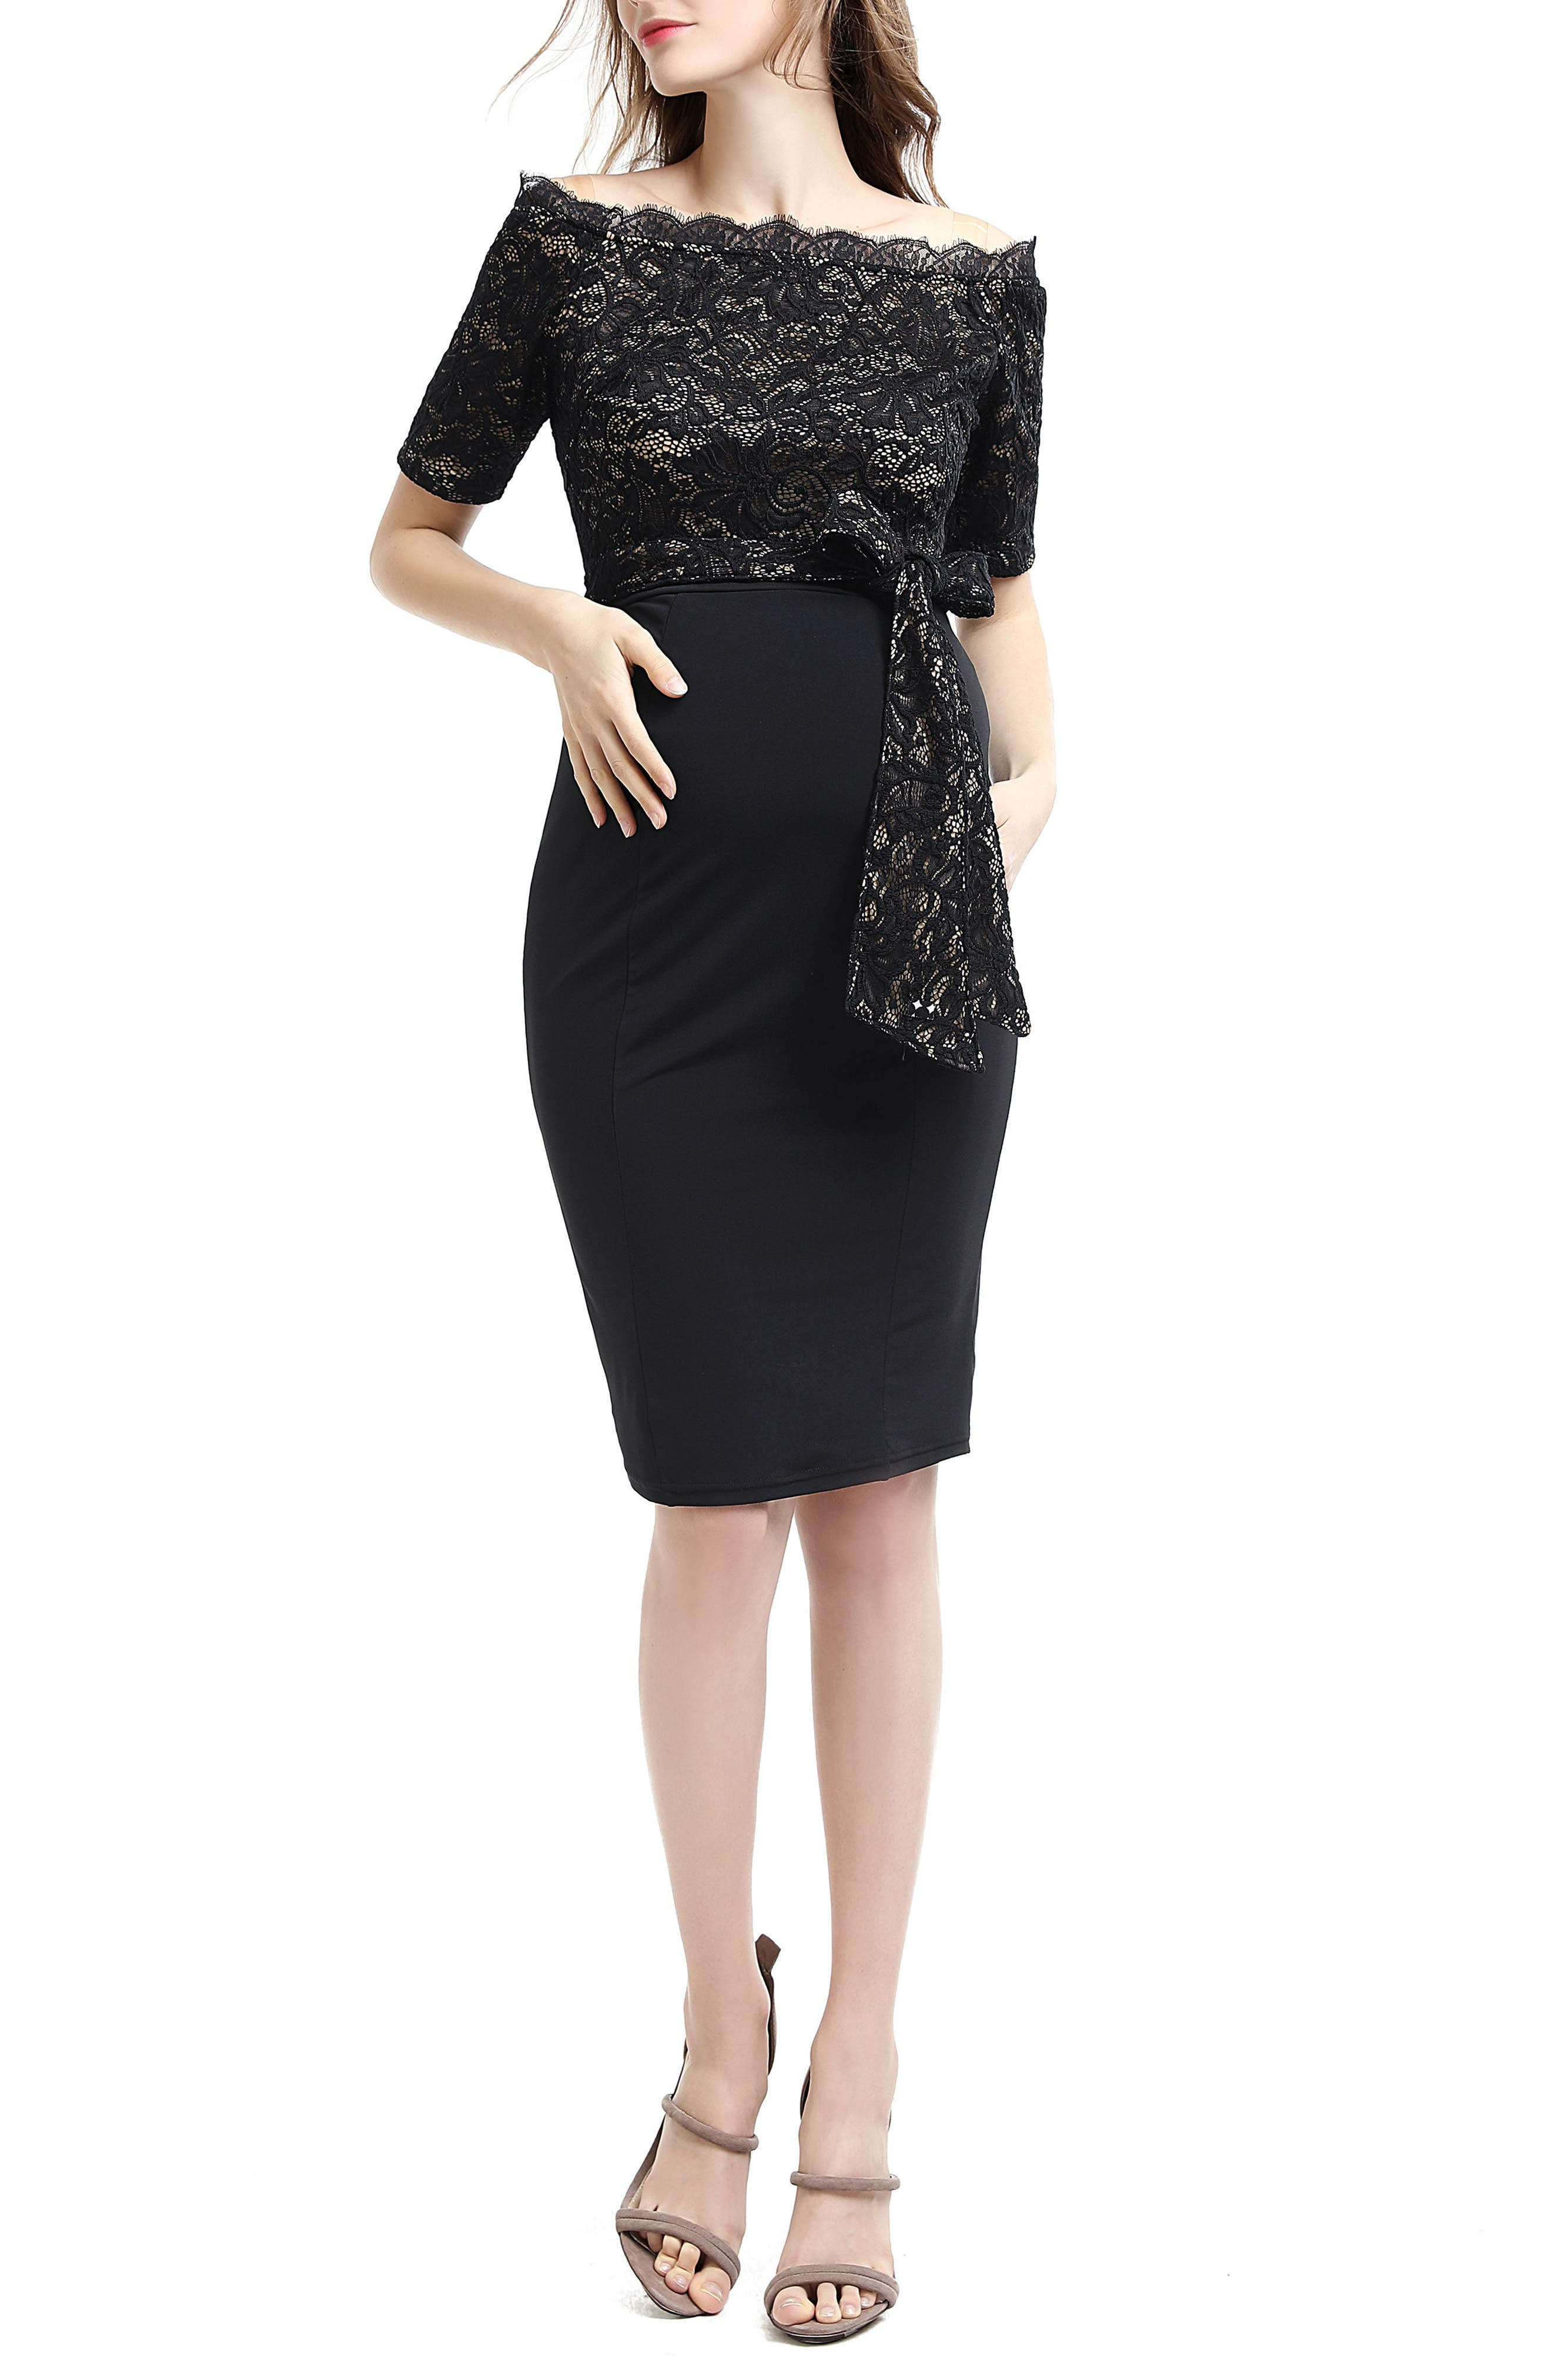 Kimi And Kai Madeline Off The Shoulder Maternity Dress, Black